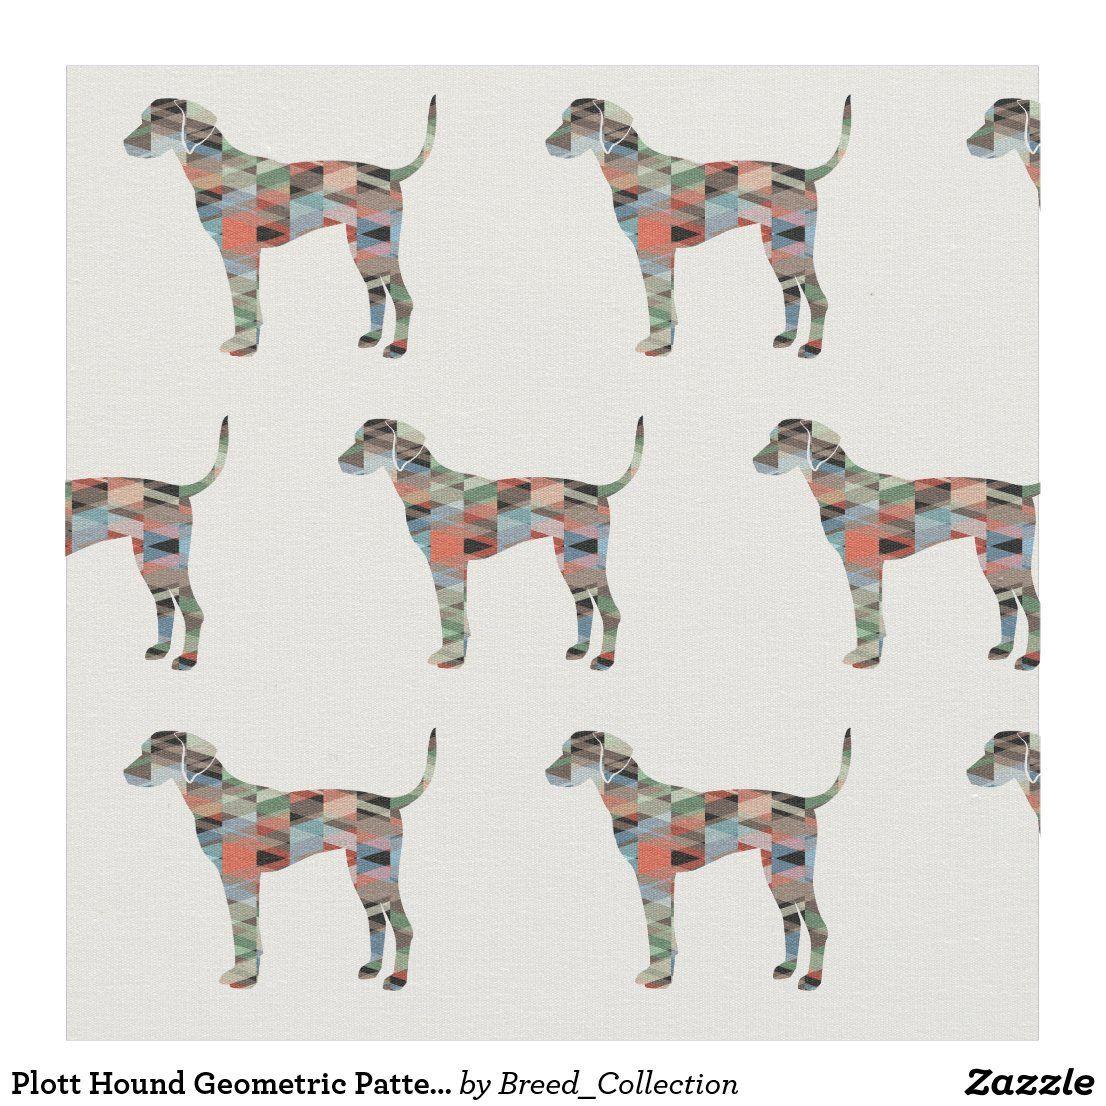 Plott Hound Geometric Pattern Silhouette Plaid Fabric